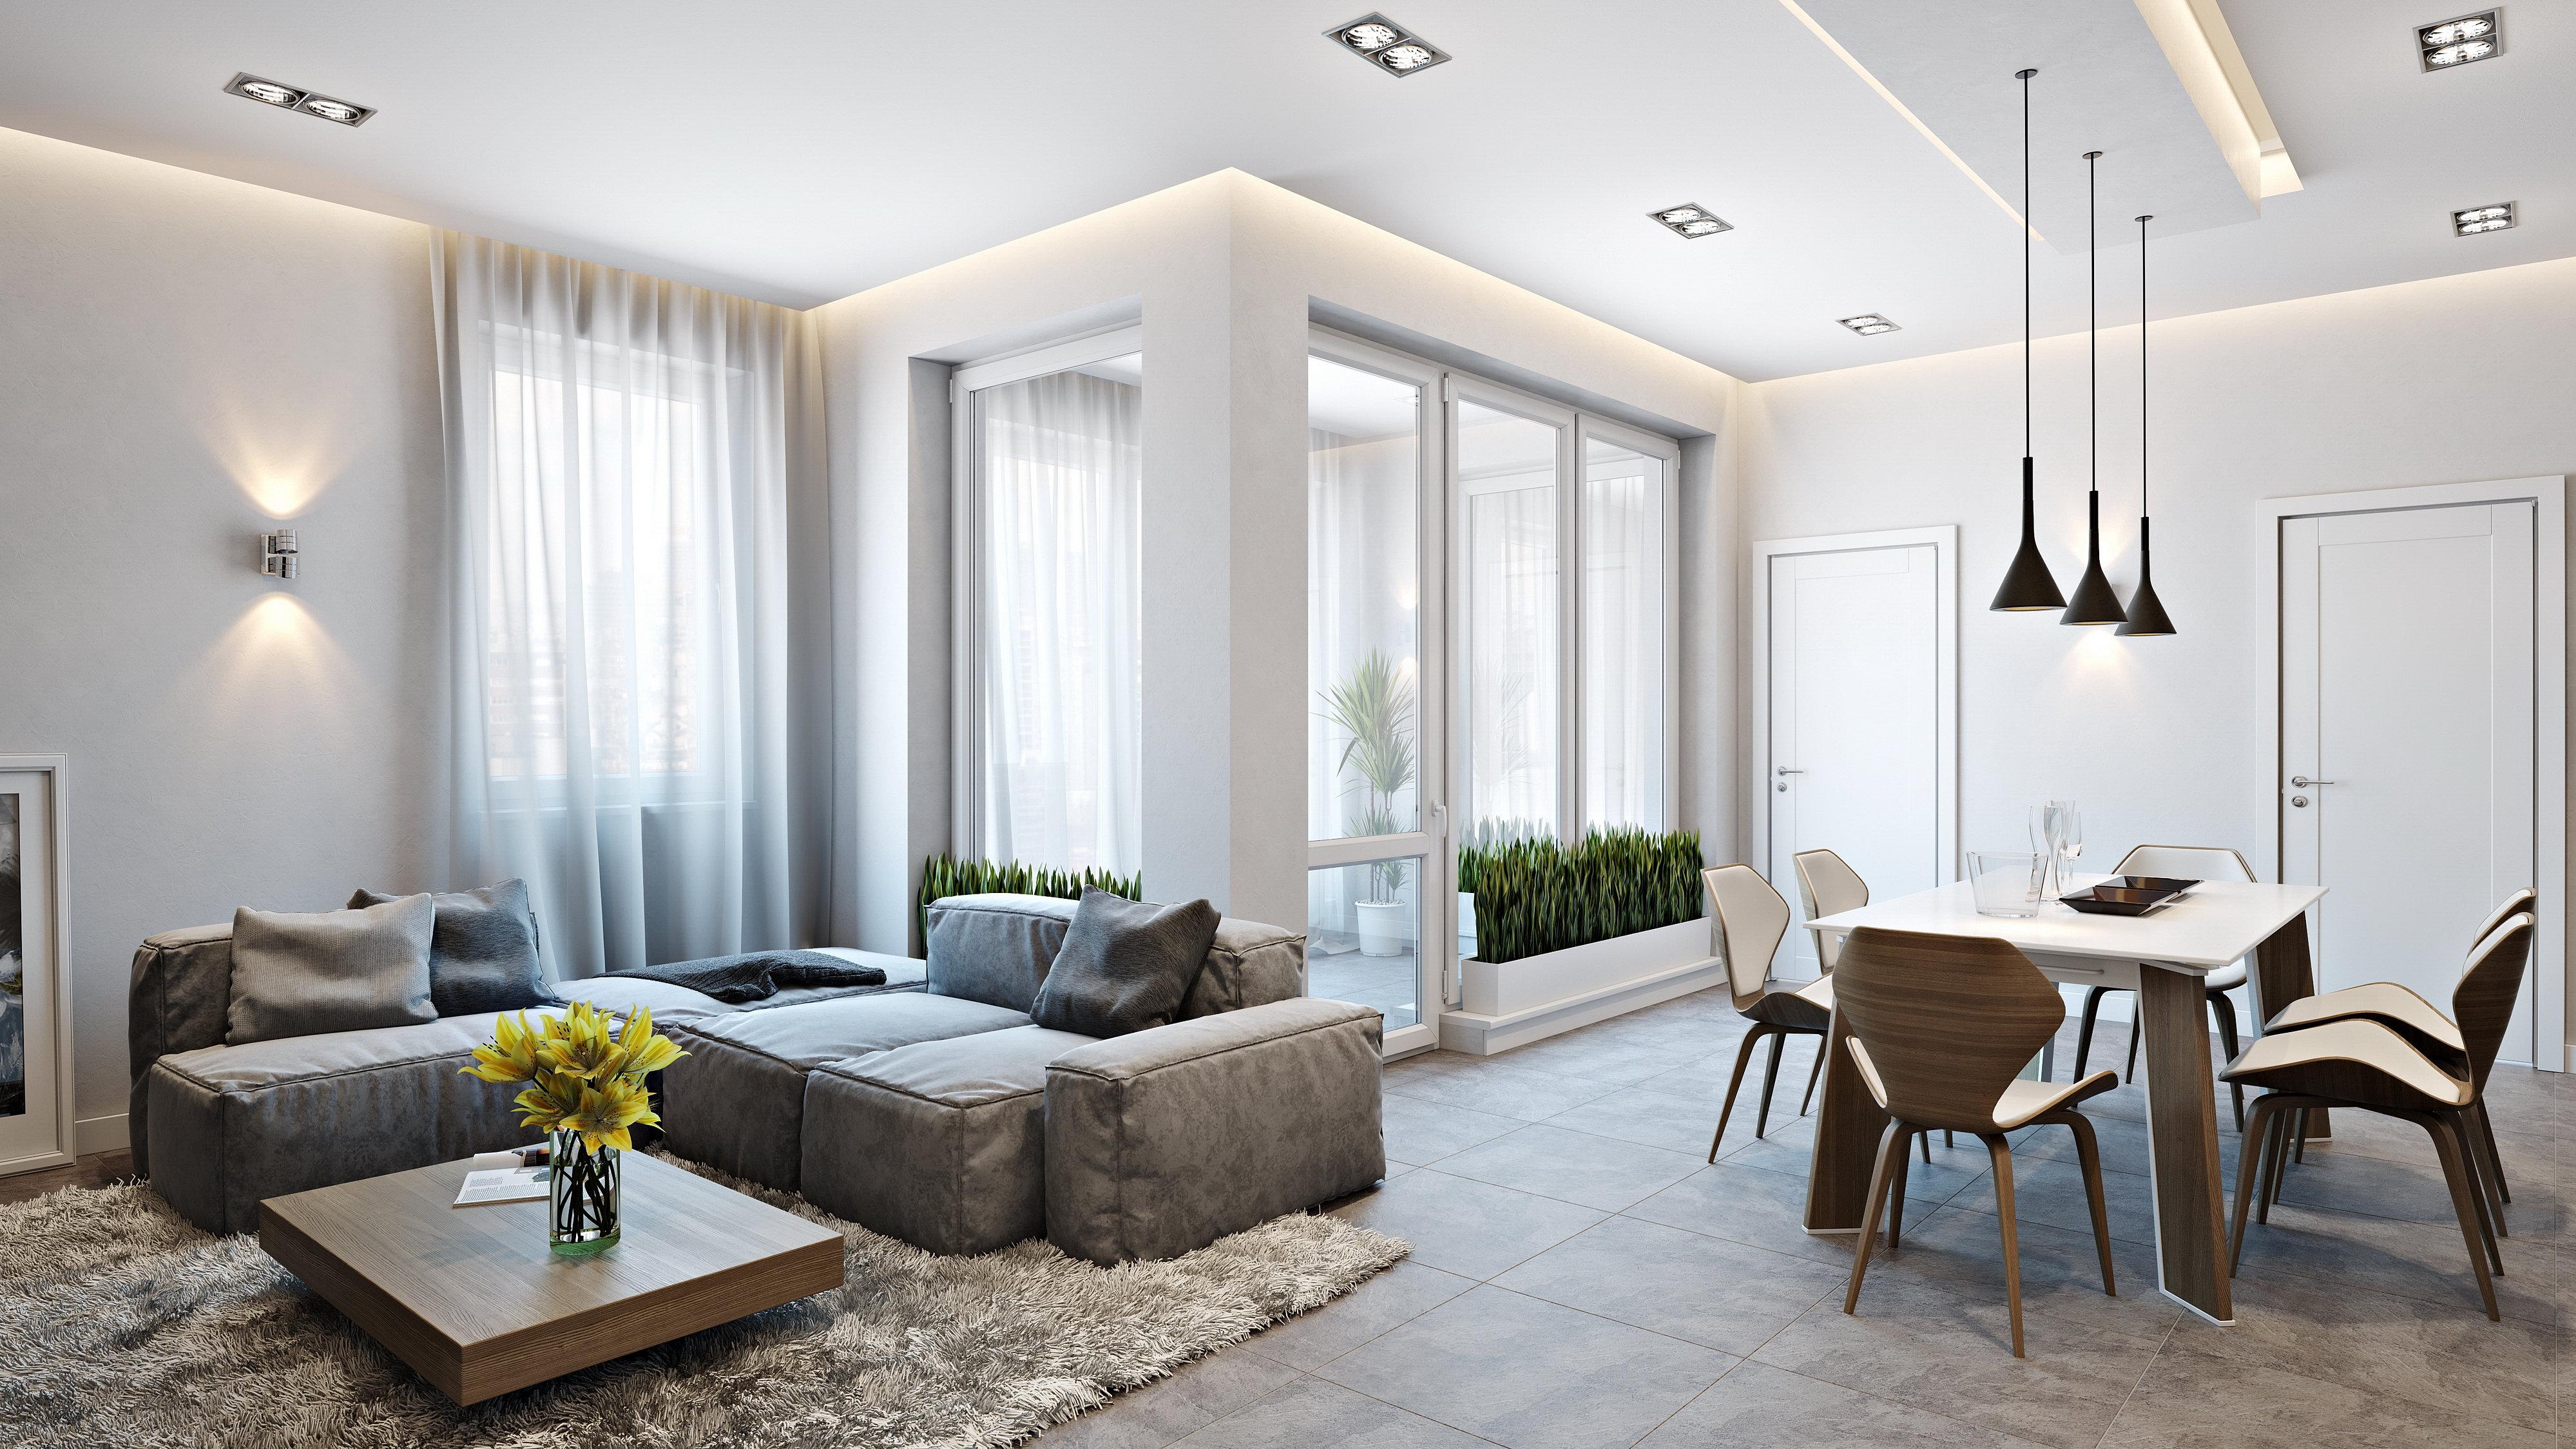 Дизайн квартиры в картинках